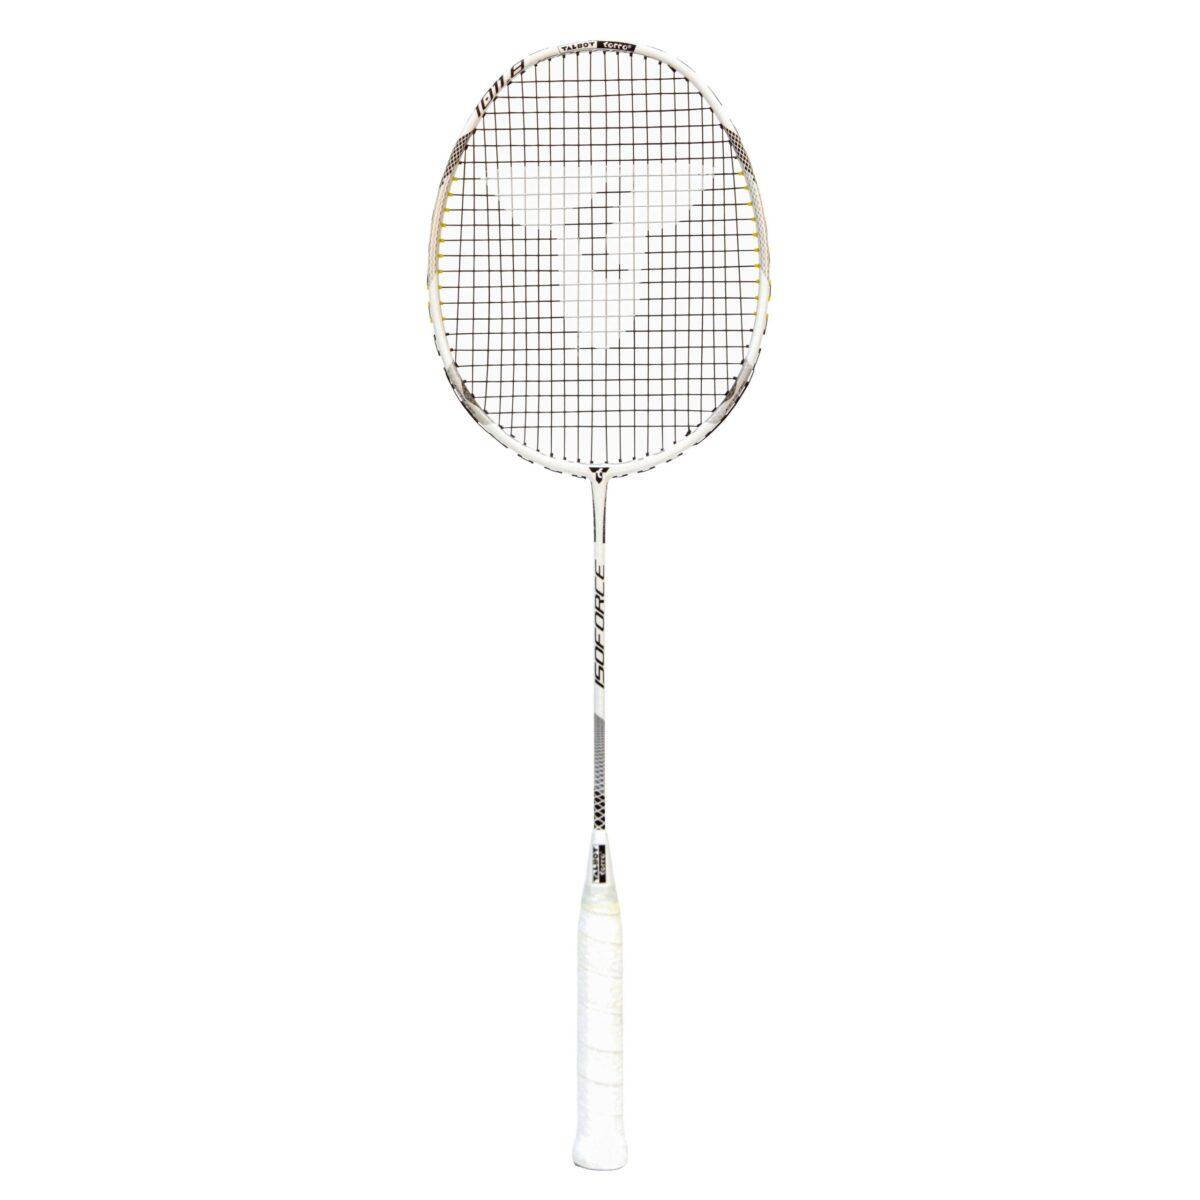 "Talbot Torro Badmintonschläger ""Isoforce 1011.8"" - Teamsport - Talbot torro"